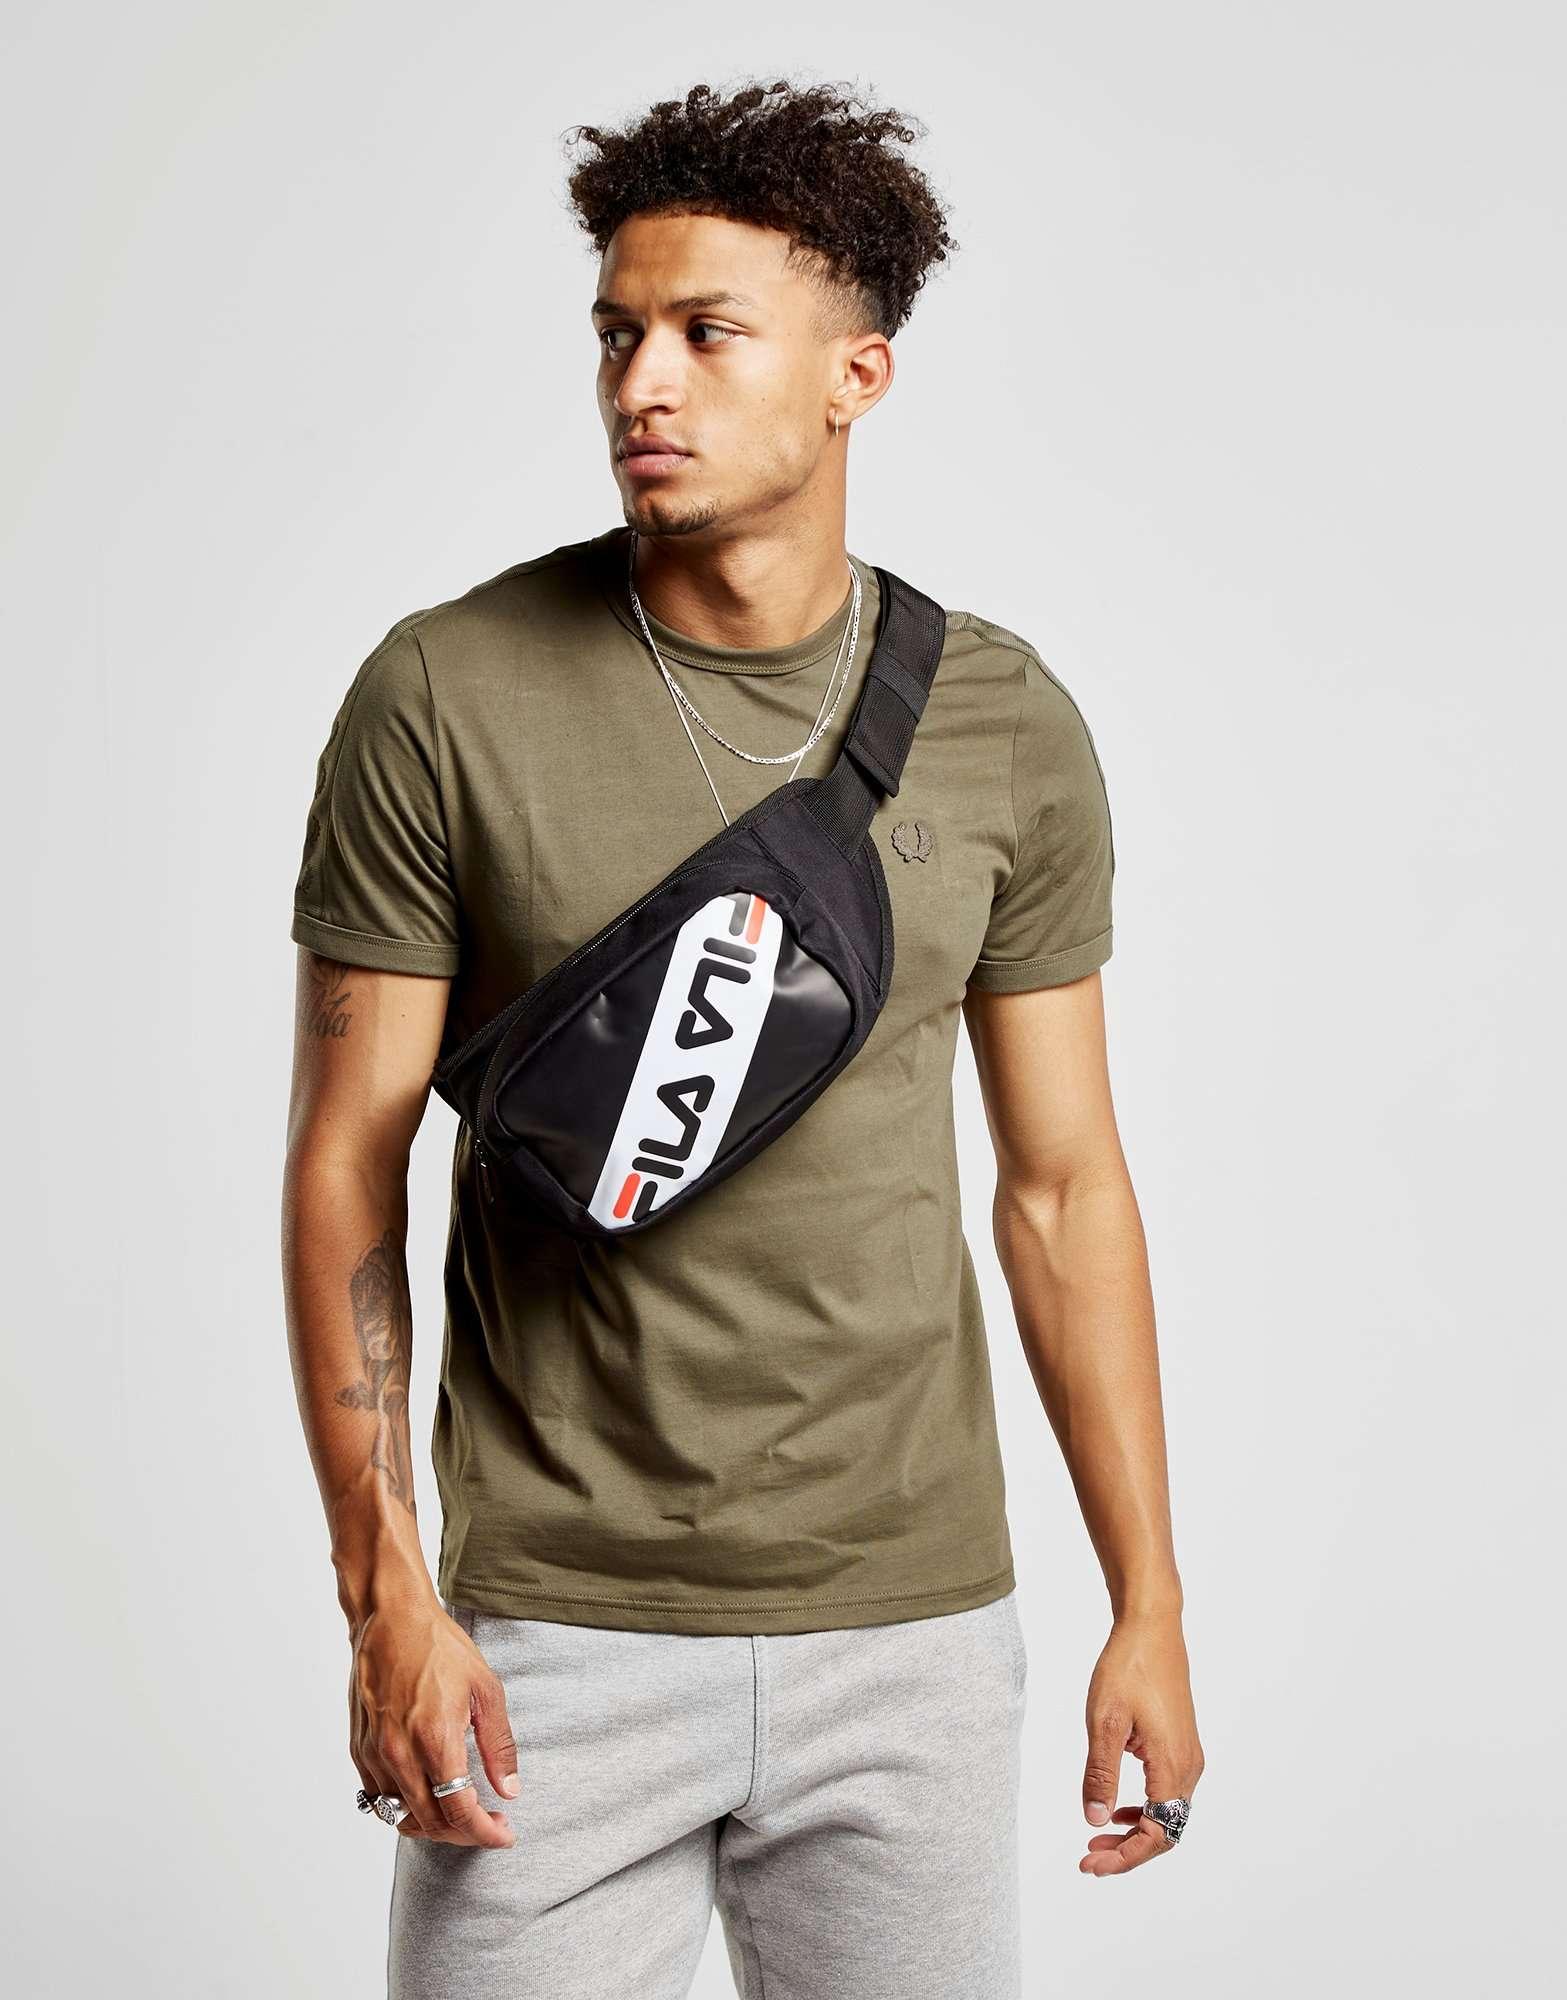 Fila Ola Waist Bag Jd Sports Ready Stock Zipper On